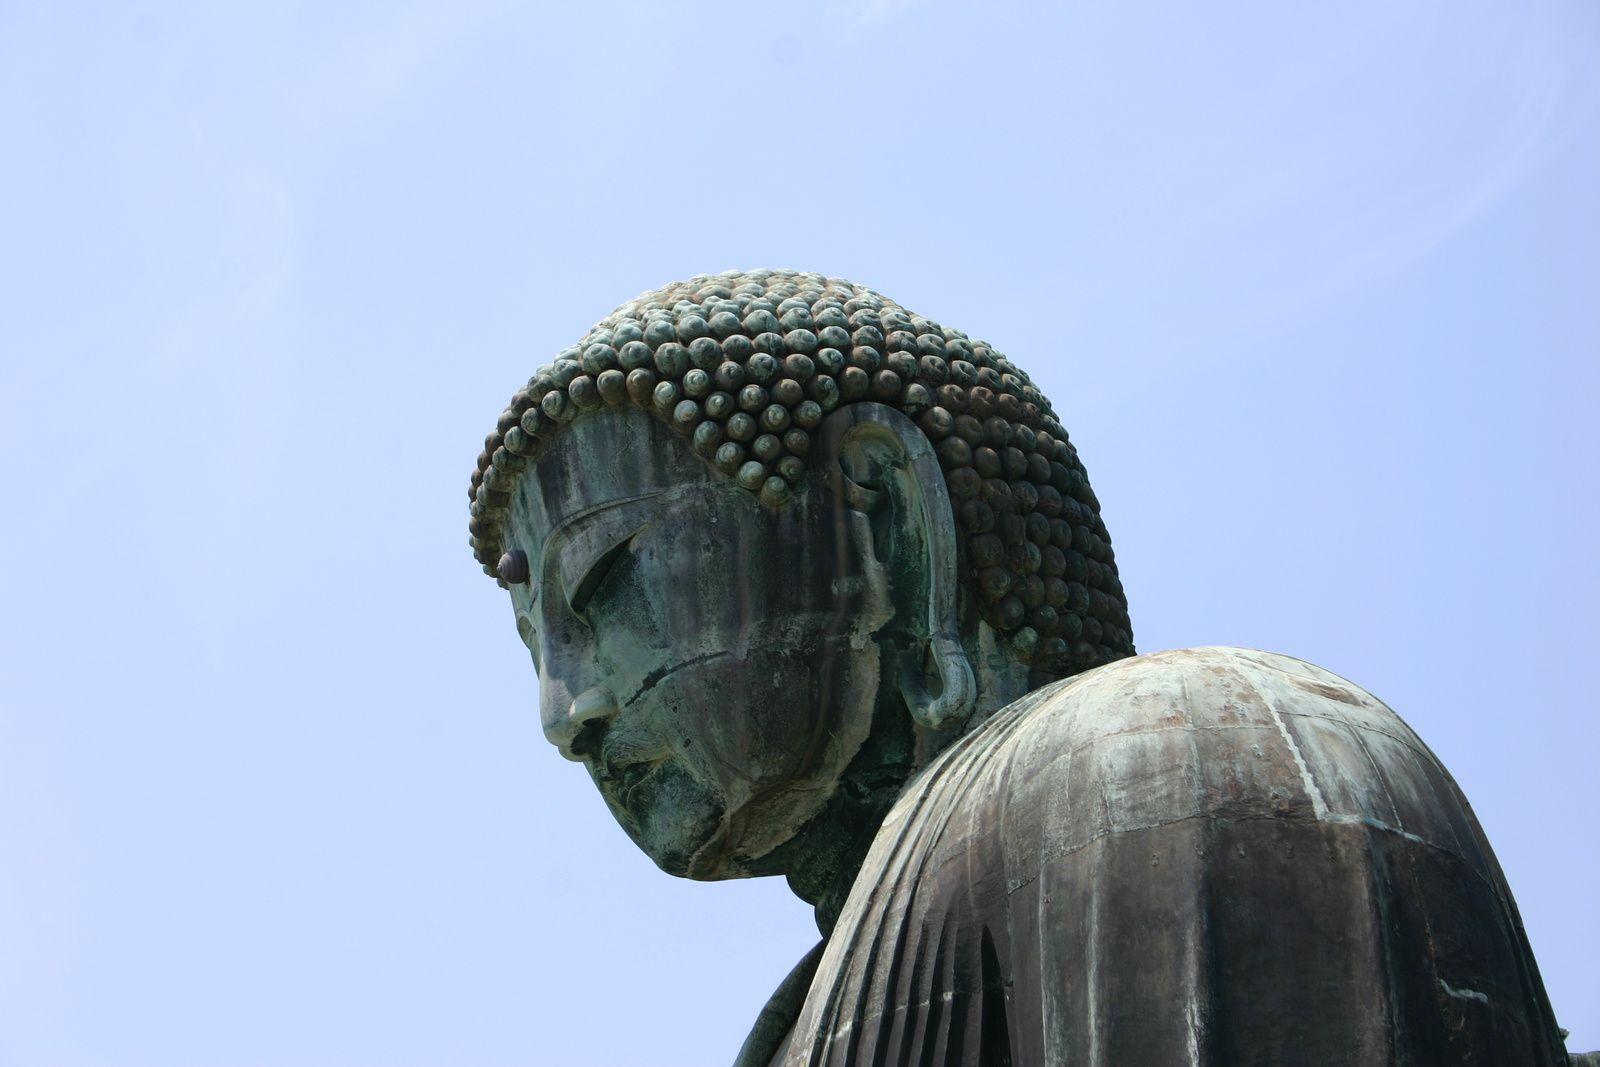 Grand Bouddha de Bronze Daibutsu, à Kamakura ancienne citée impériale